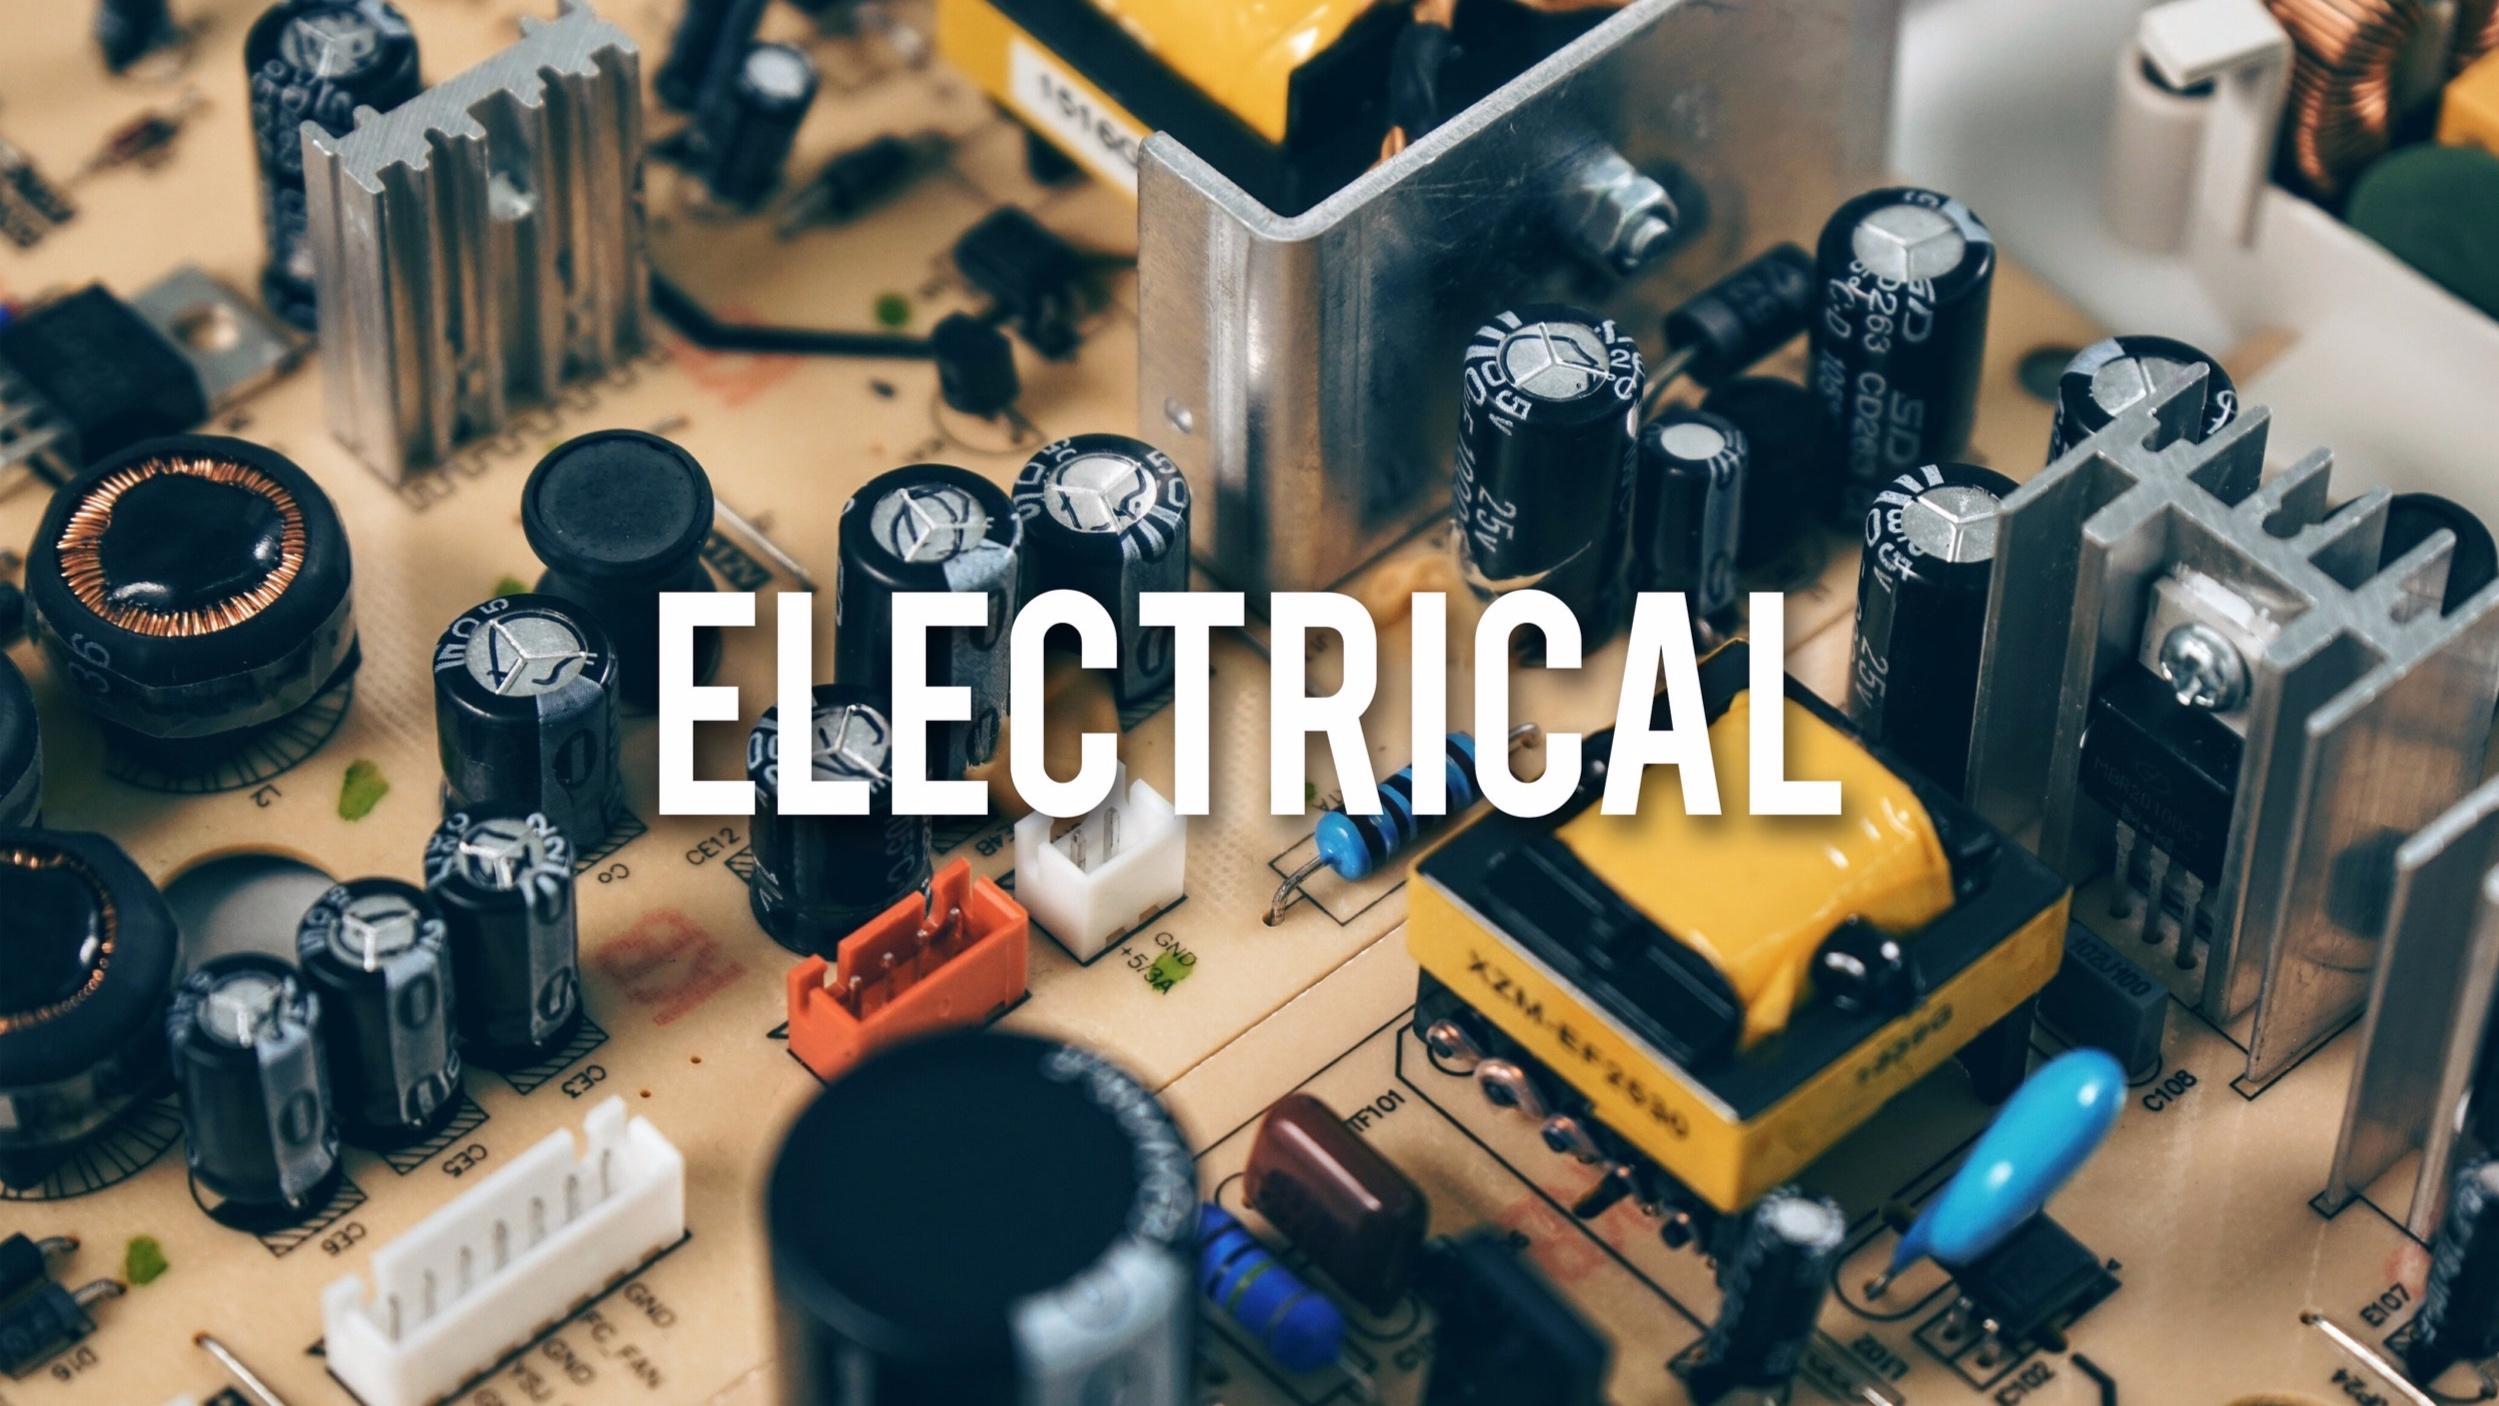 S.E Electrical.jpg